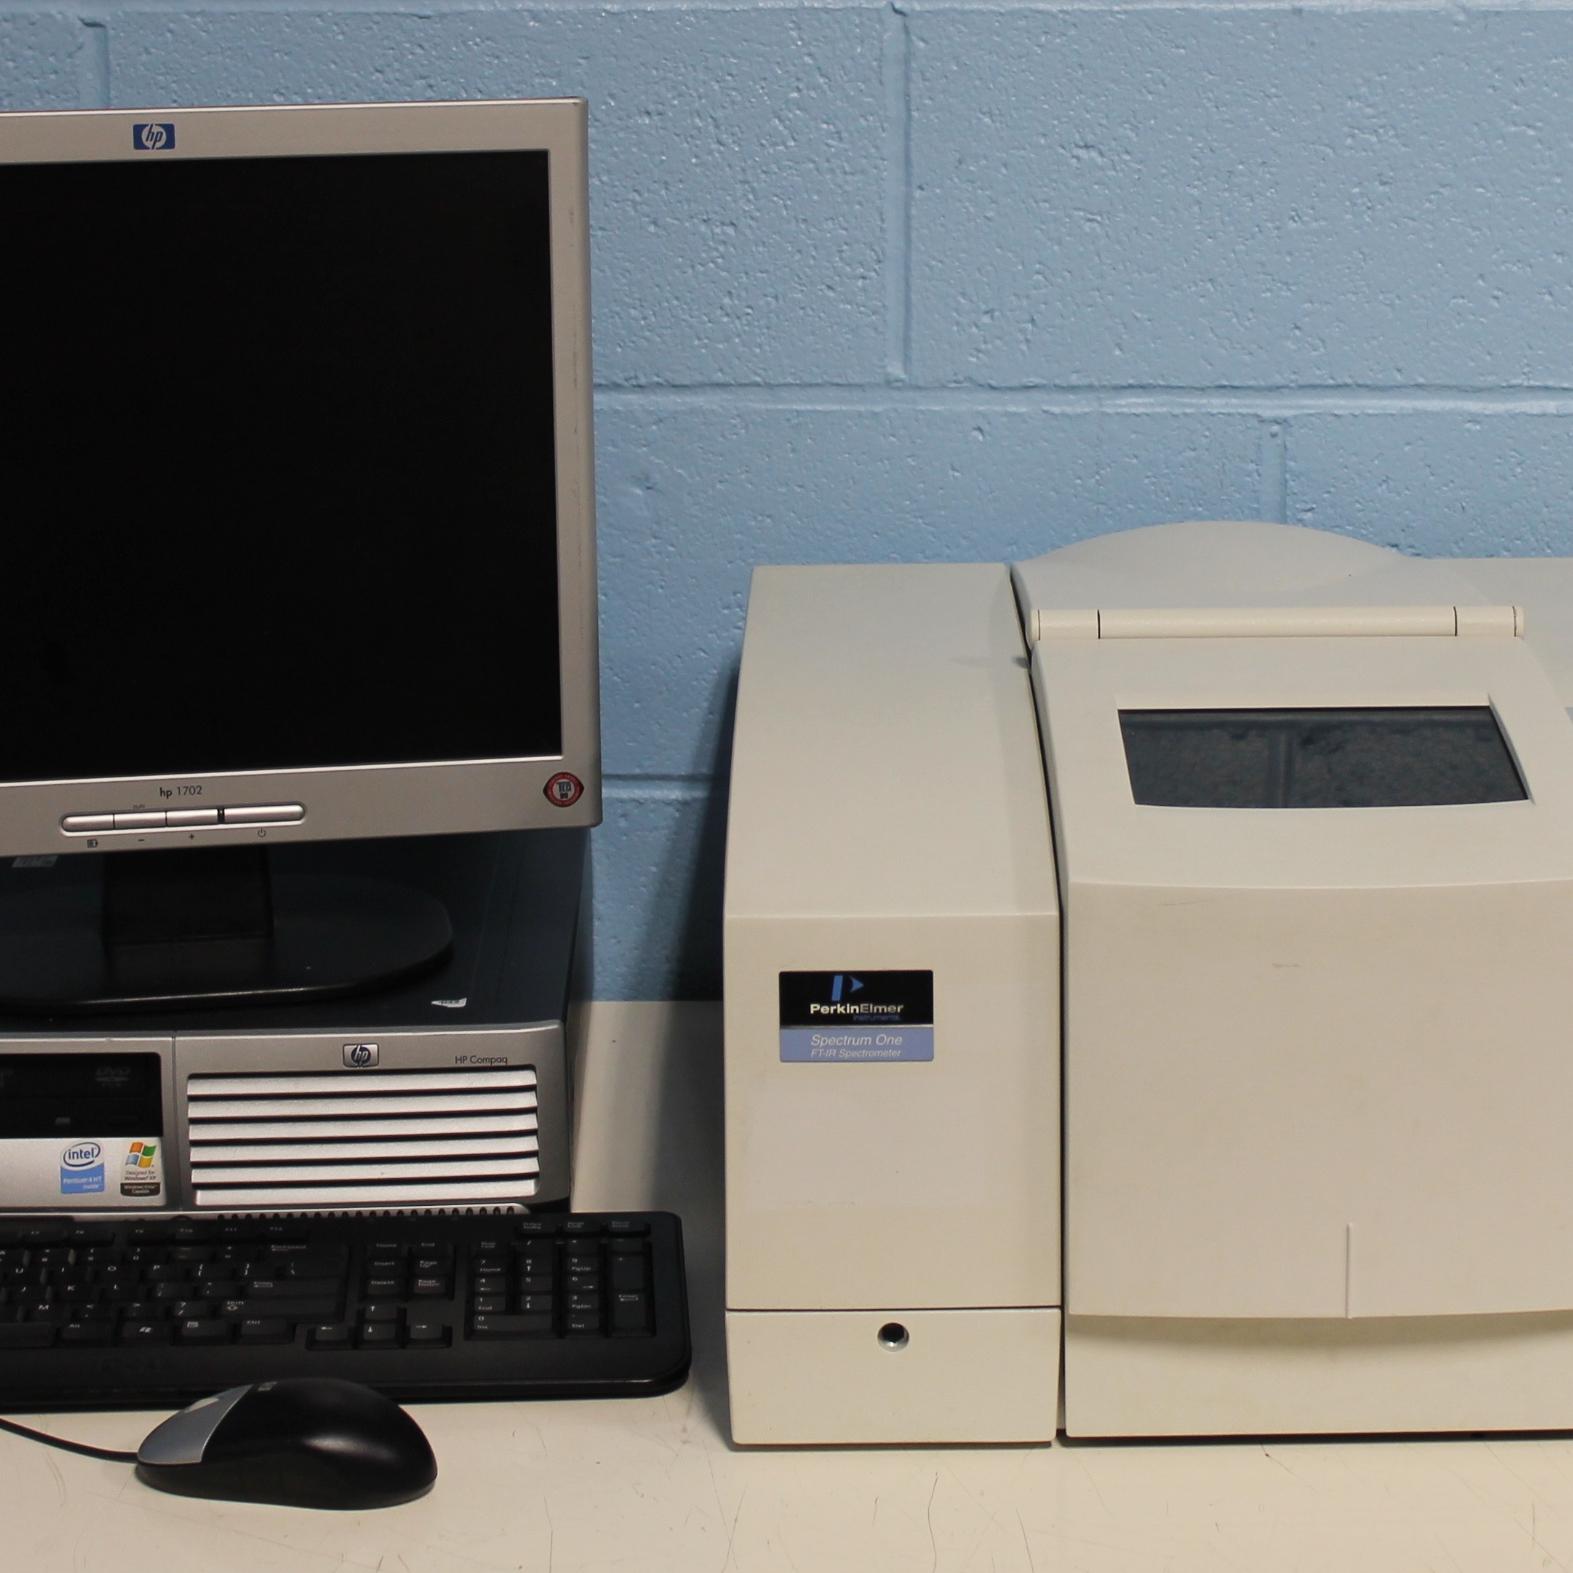 Spectrum One FT-IR Spectrometer Name